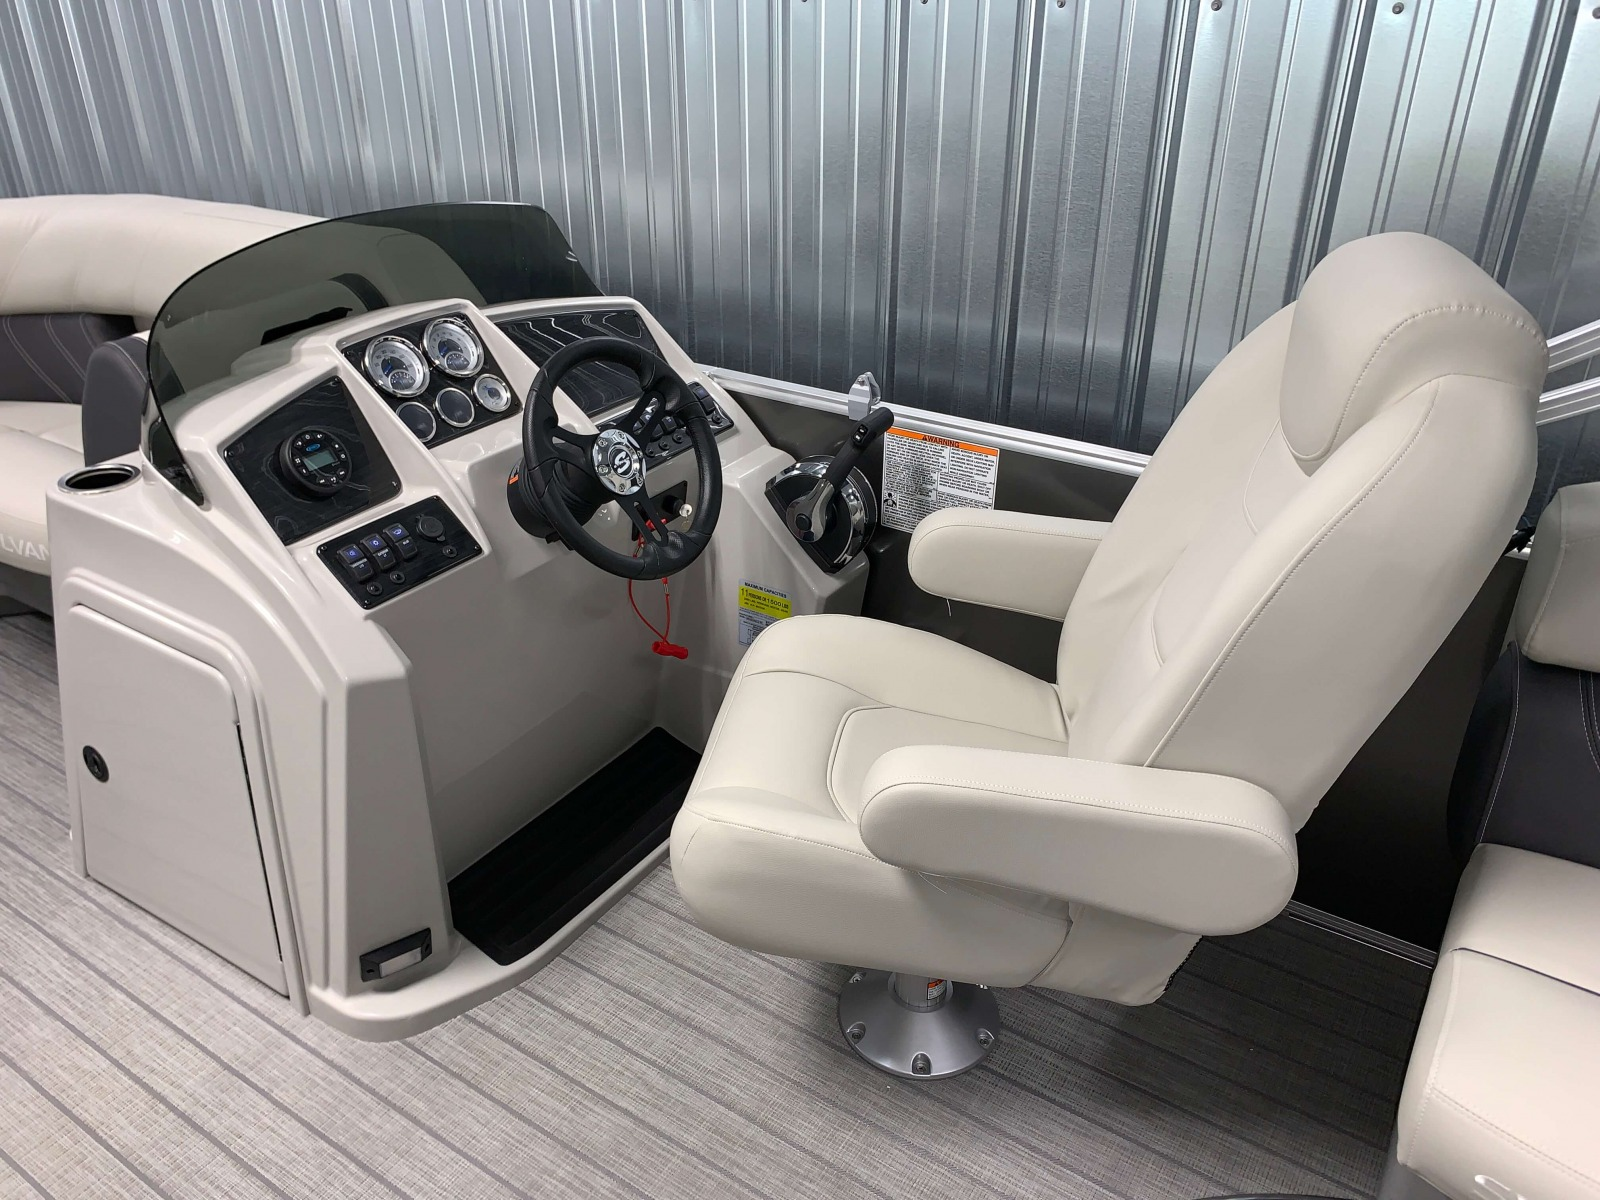 Fiberglass Helm of a 2021 Sylvan Mirage 8520 LZ Tritoon Boat